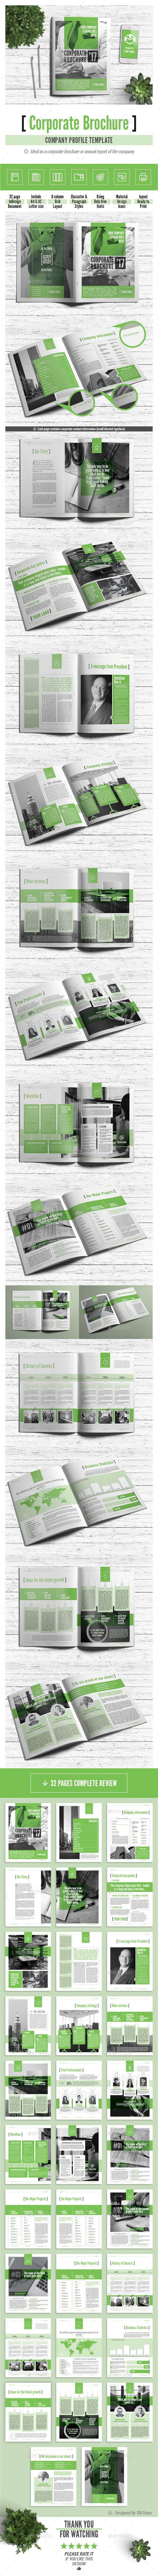 Corporate Brochure - Company Profile Multipurpose Template | Finales